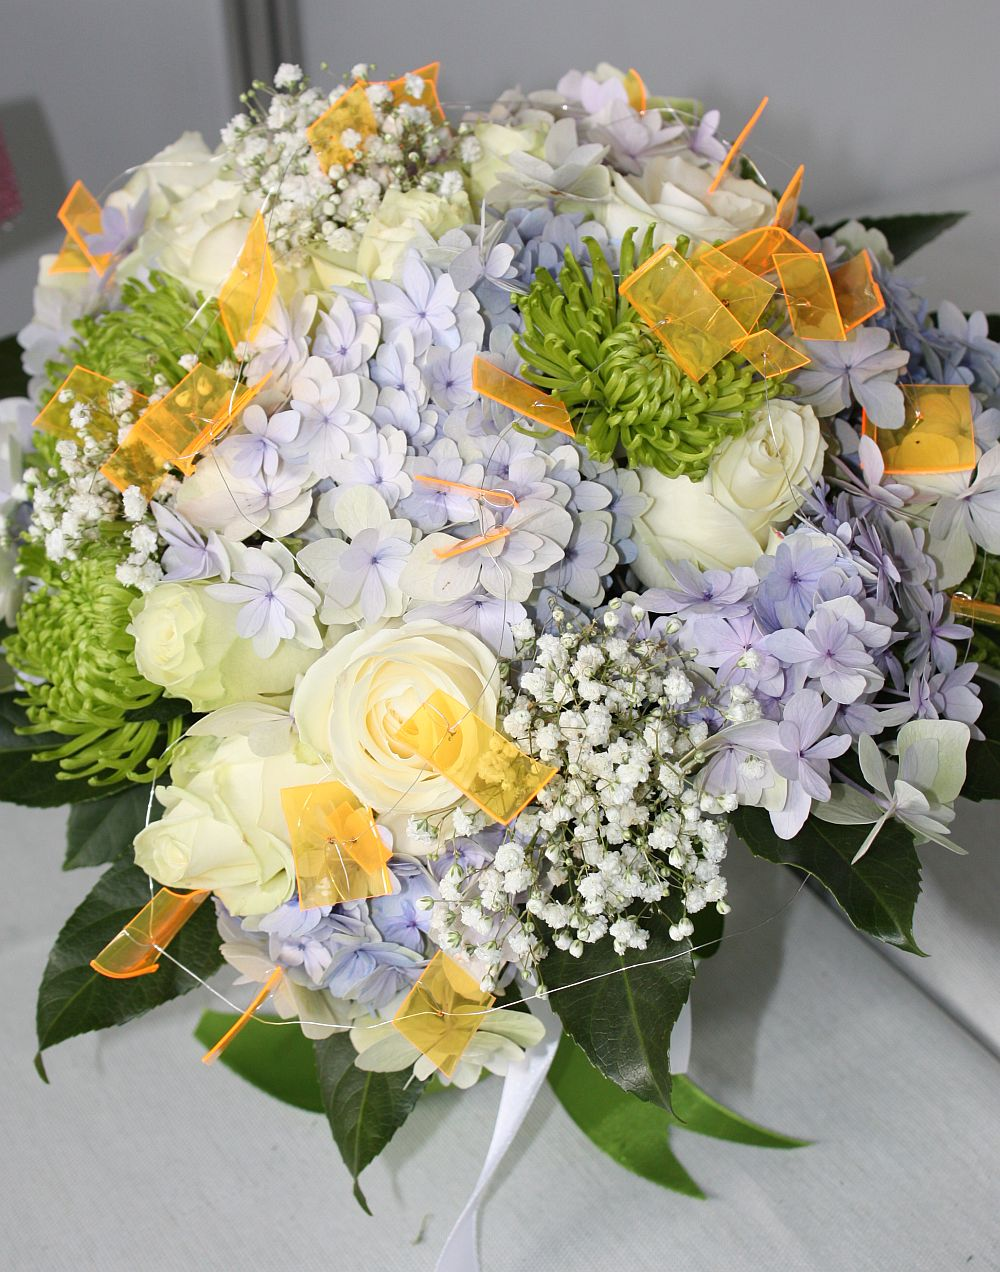 adelaparvu.com despre targul de plante, flori si peisagistica Hartus Florshow 2014 (10)